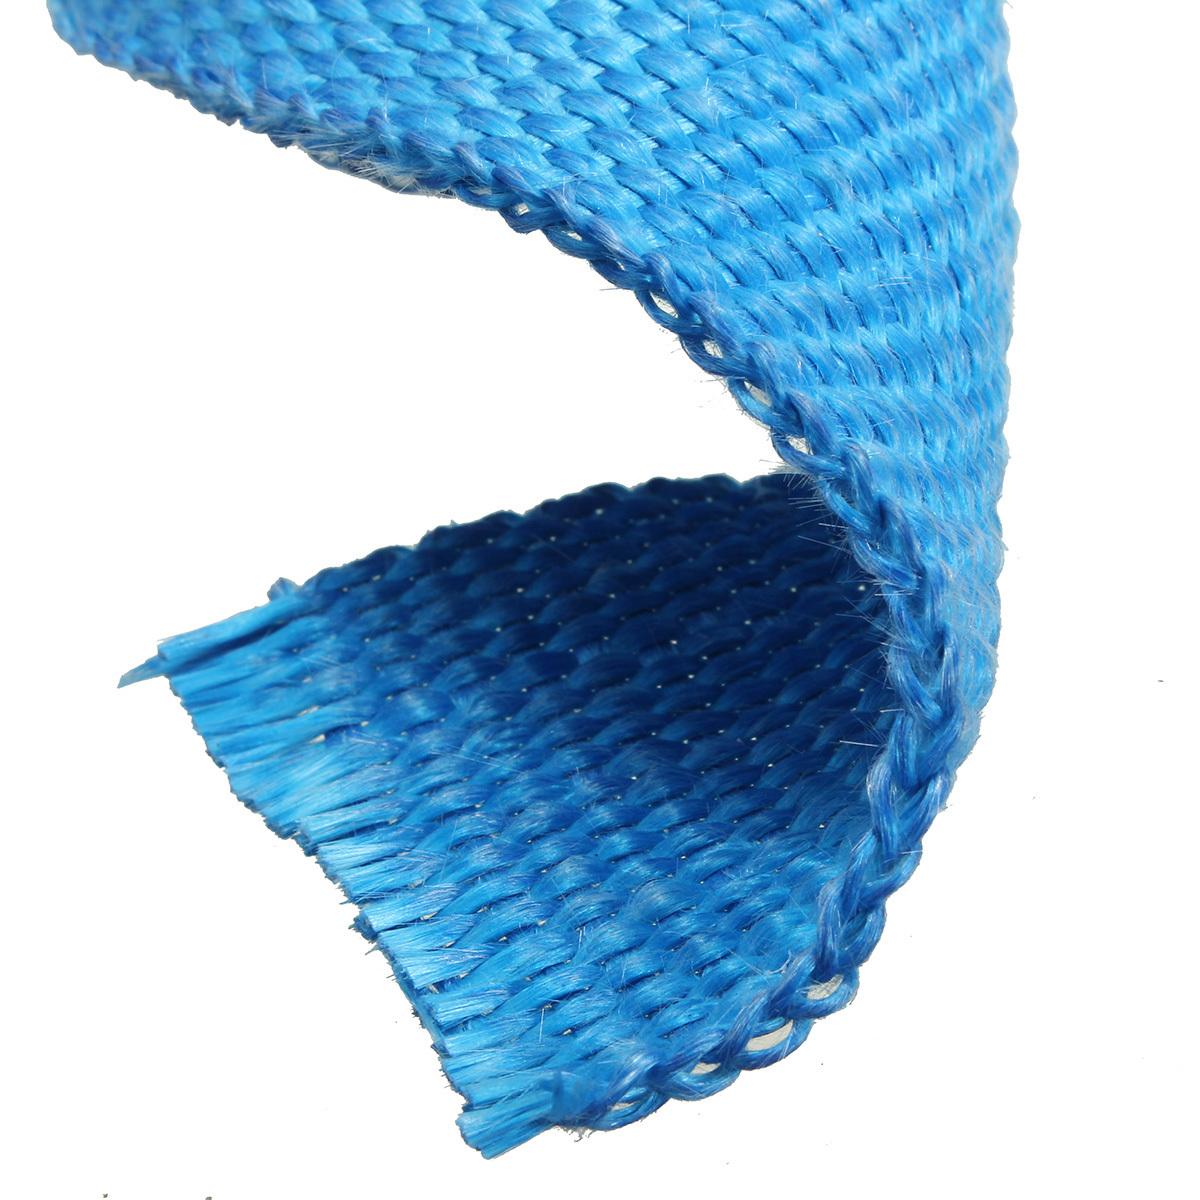 Performa Knalpot Berjenis Downpipe Isolasi Panas Bungkus 5 08 Cm Biru Murah